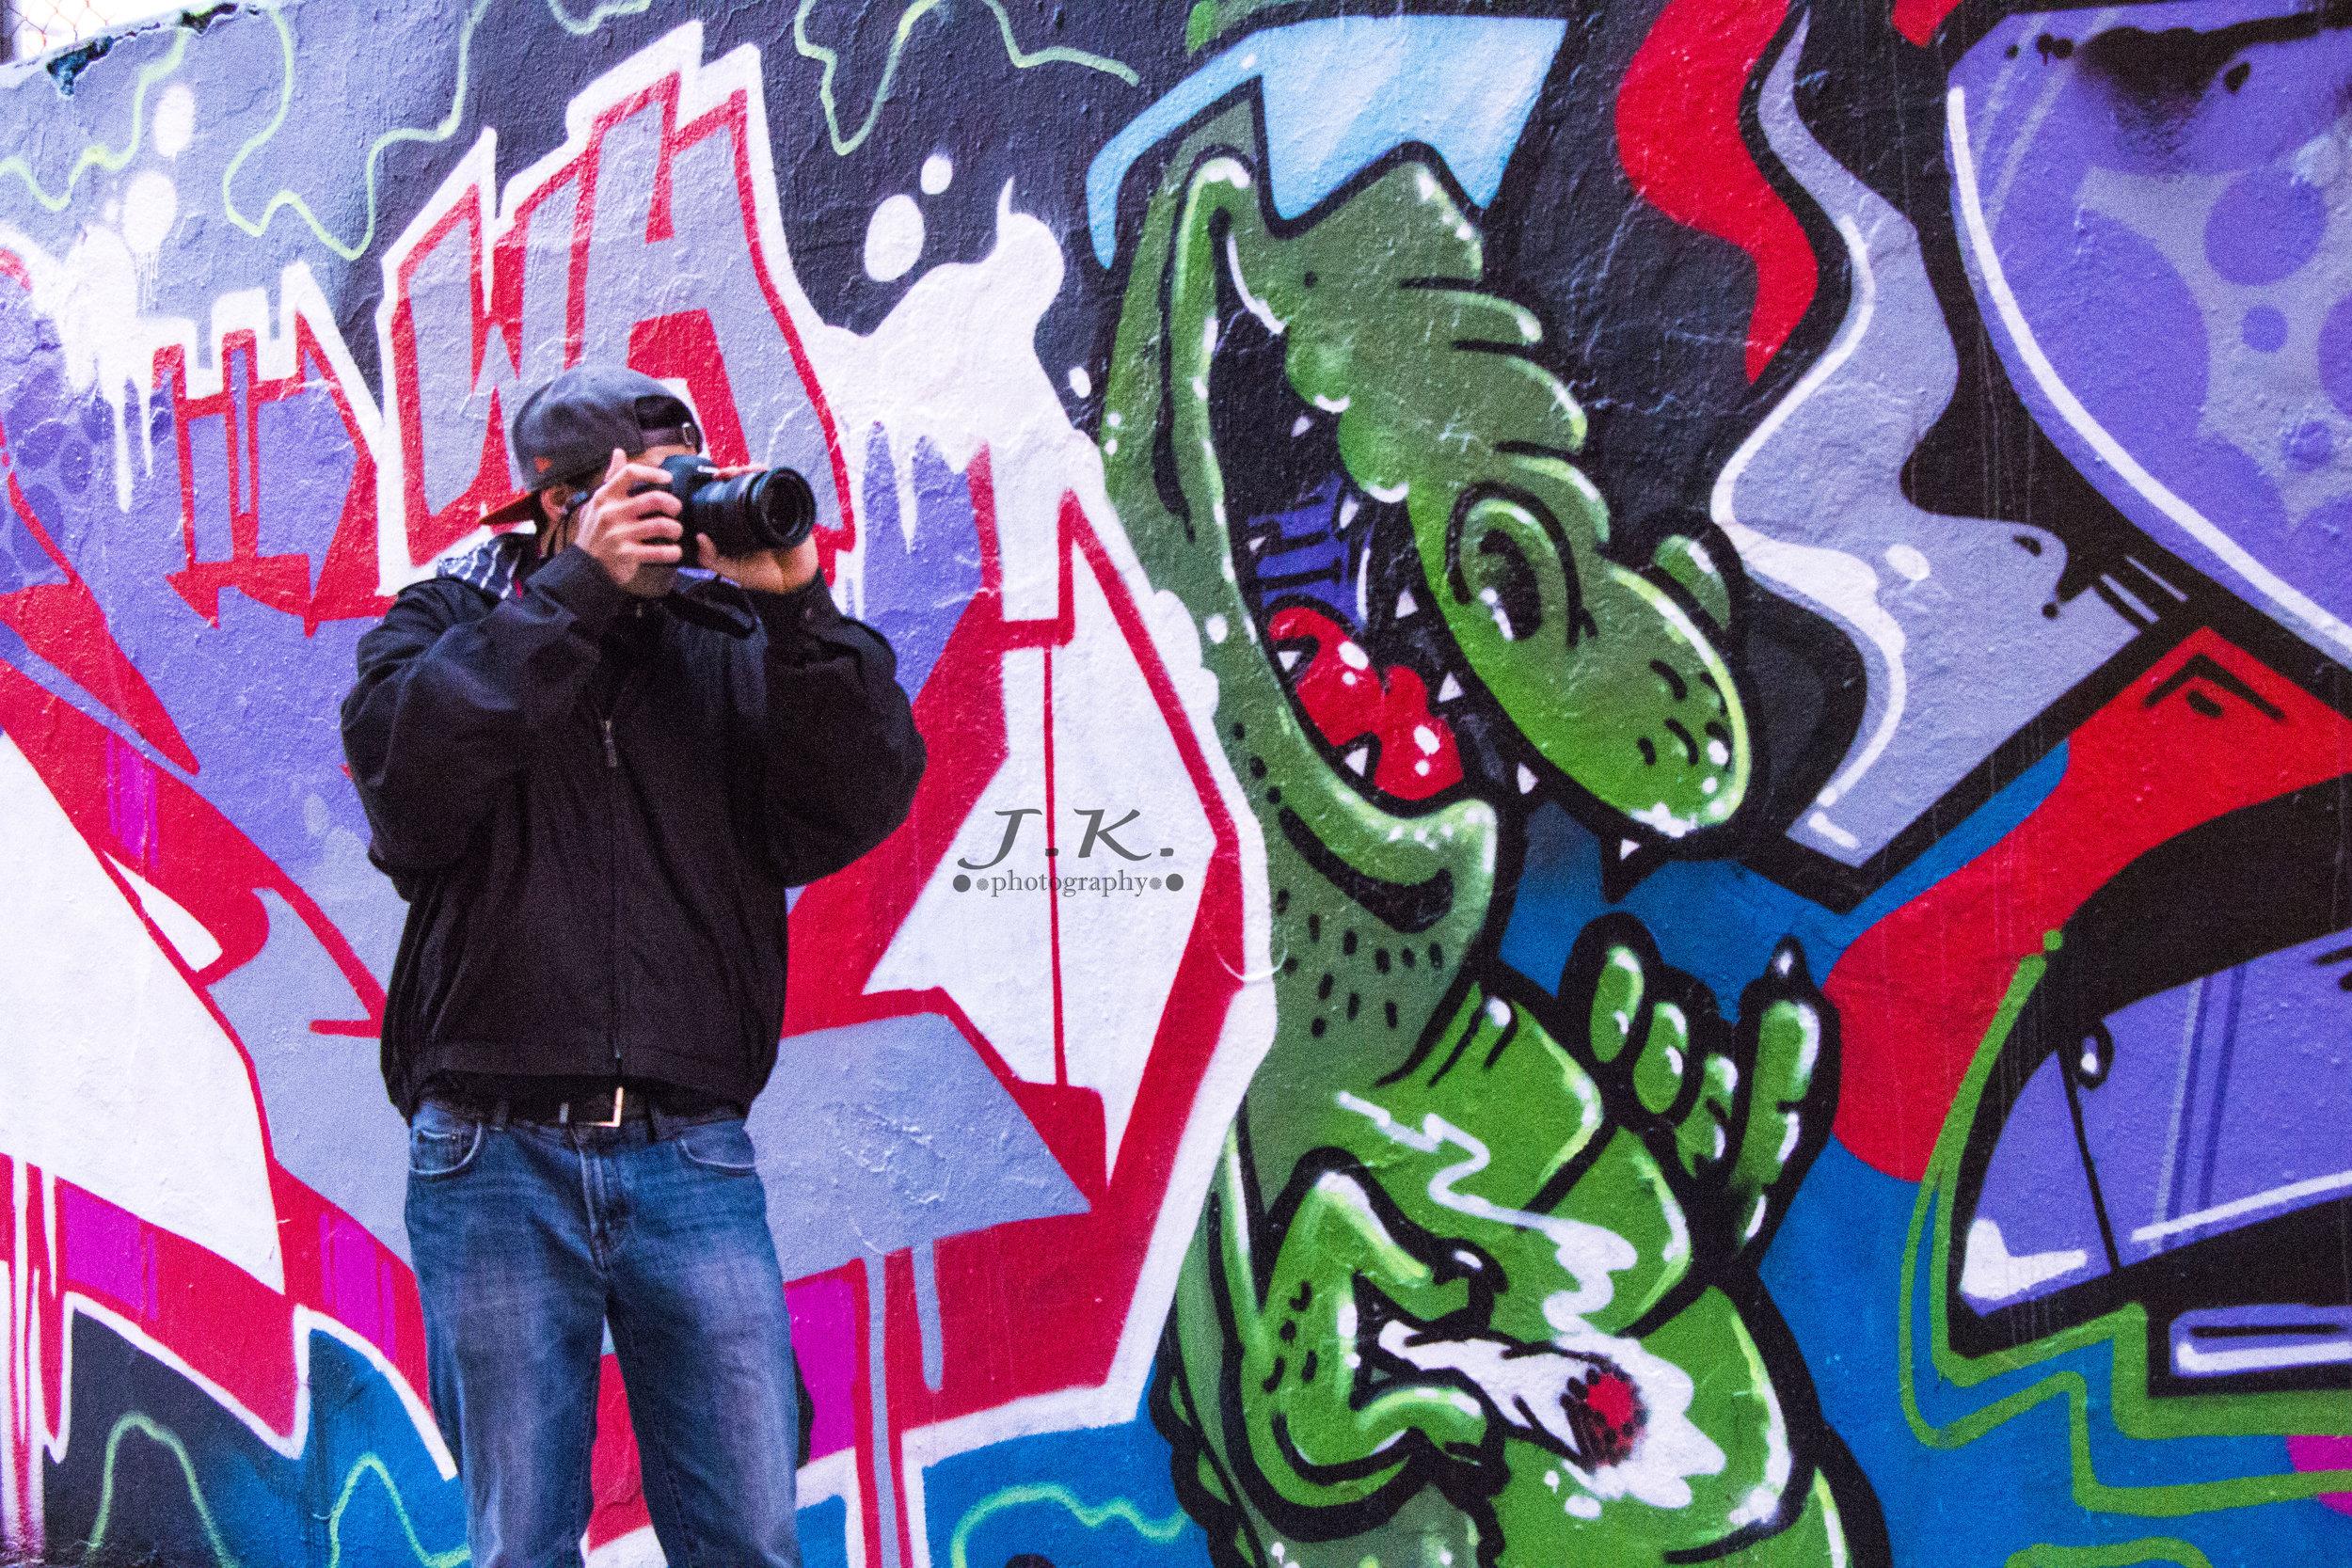 JK Creative Photographer